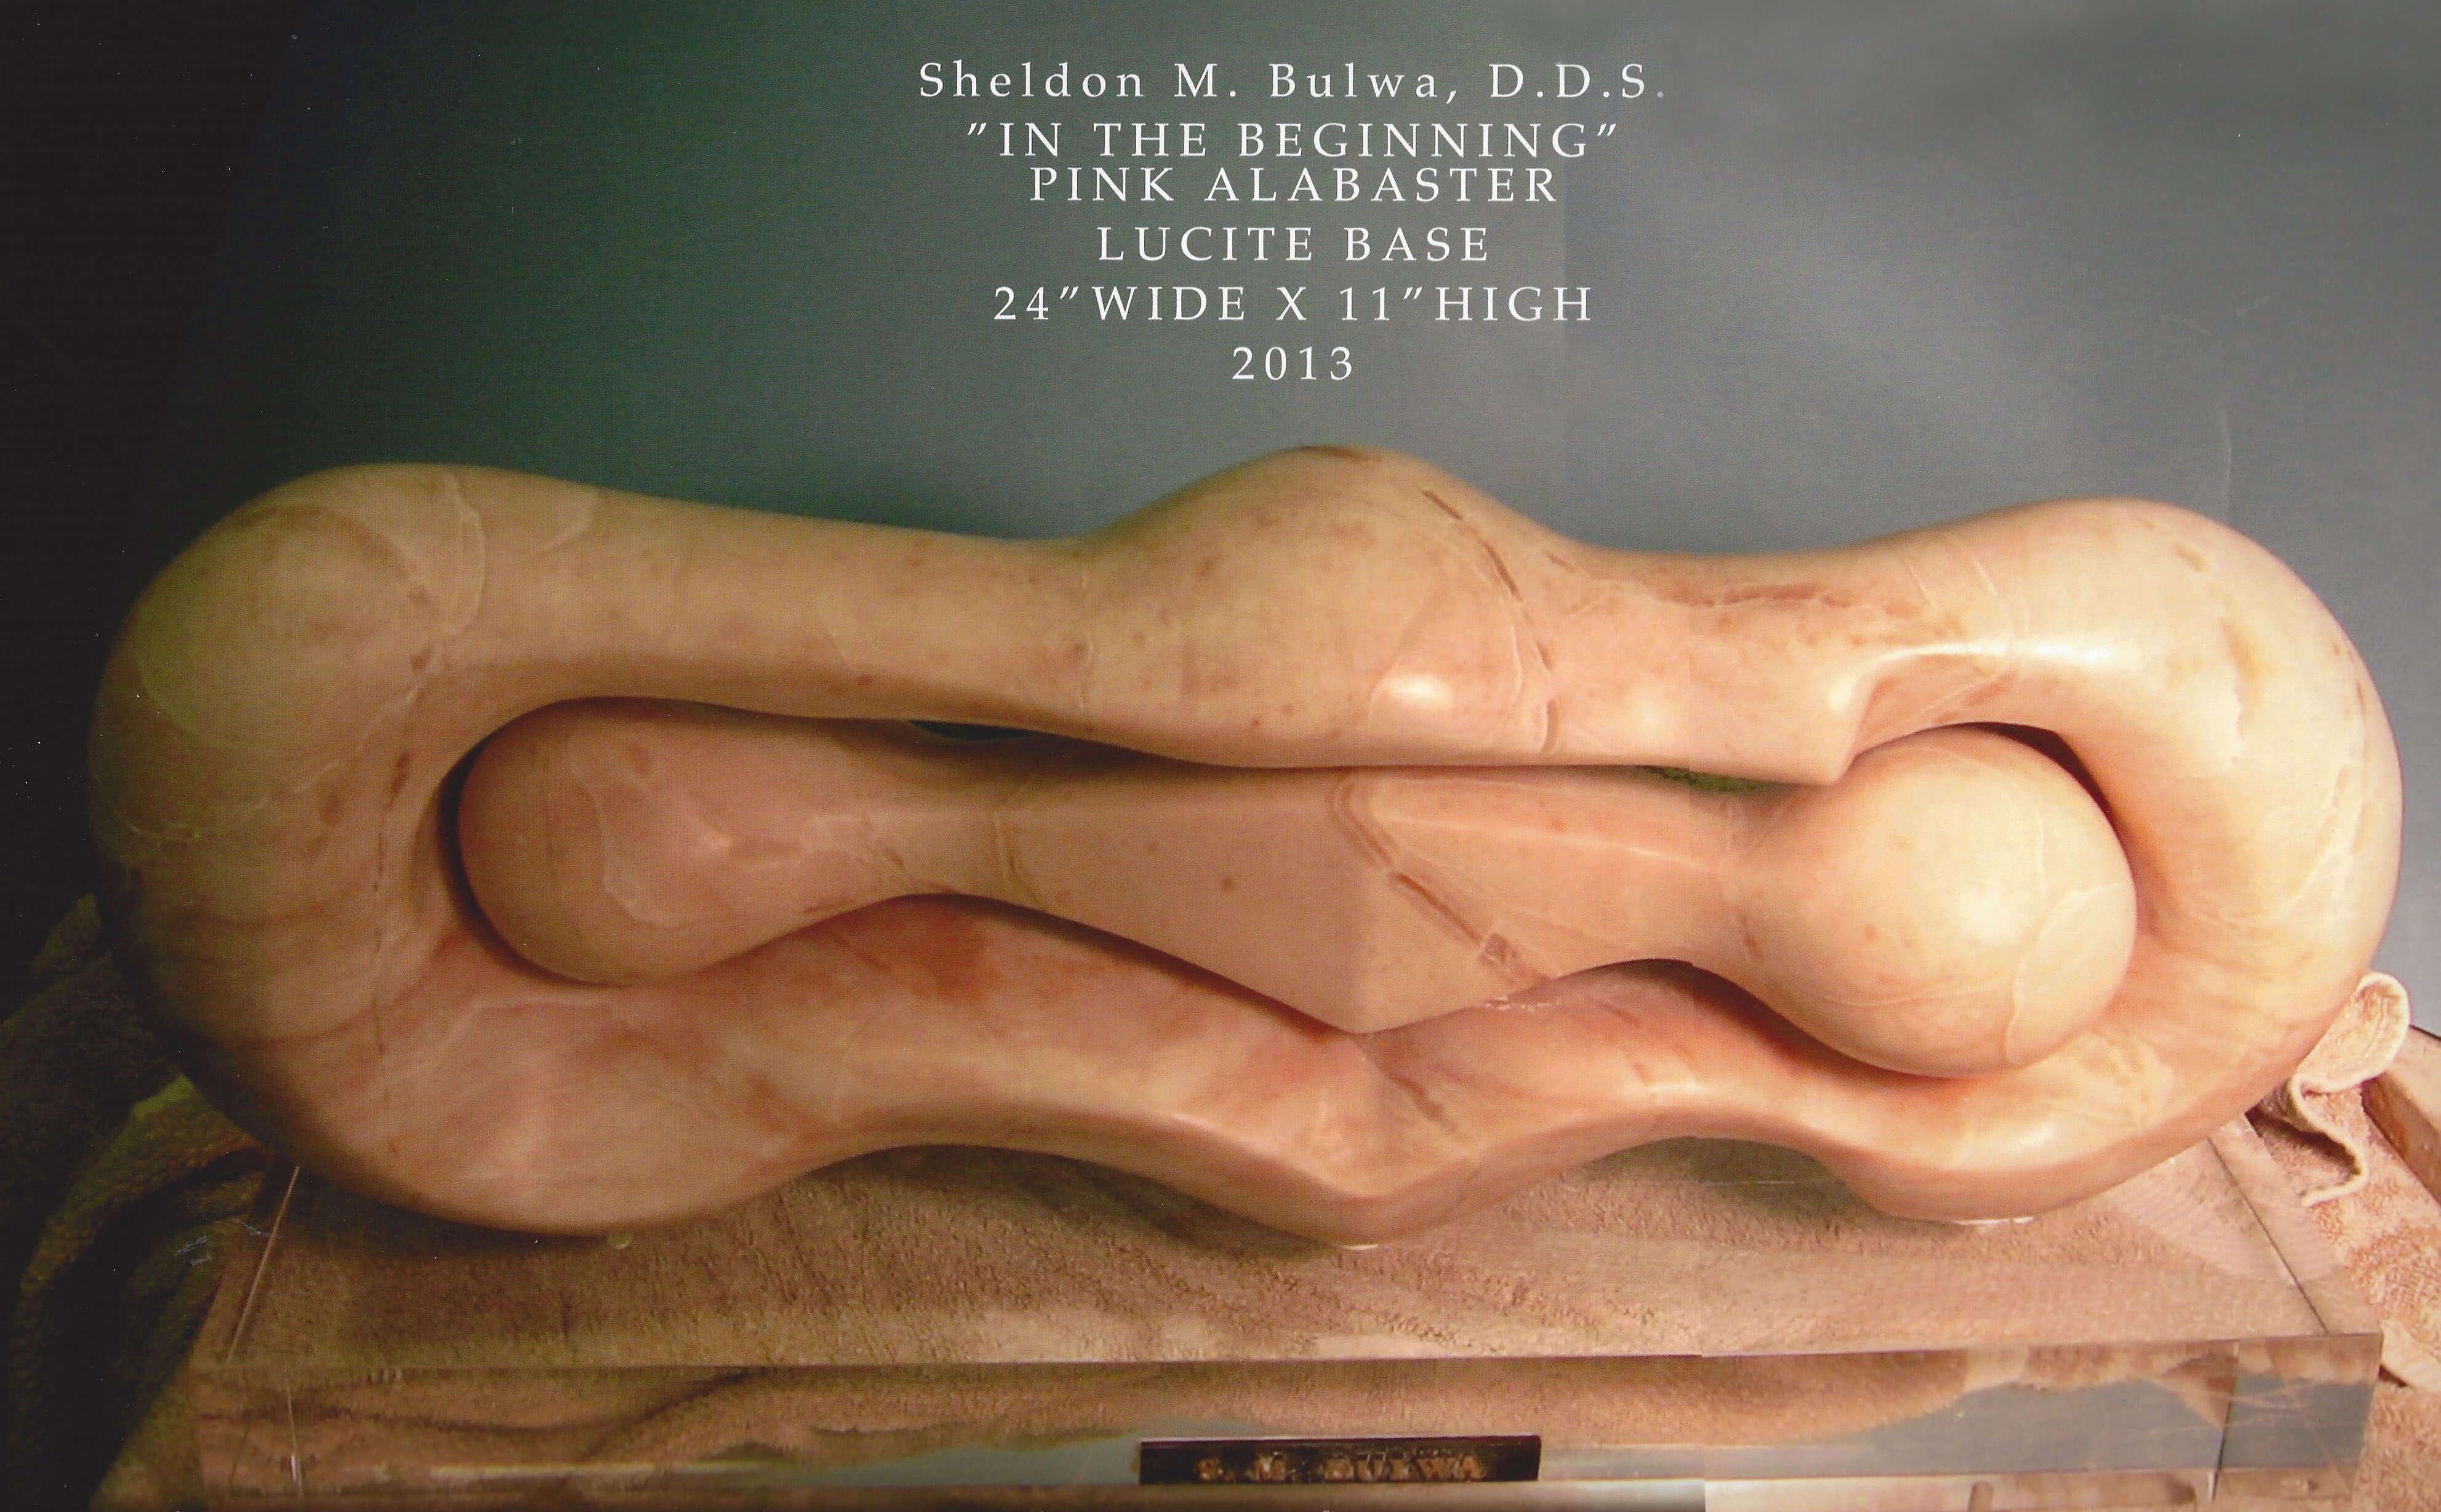 Sheldon M. Bulwa